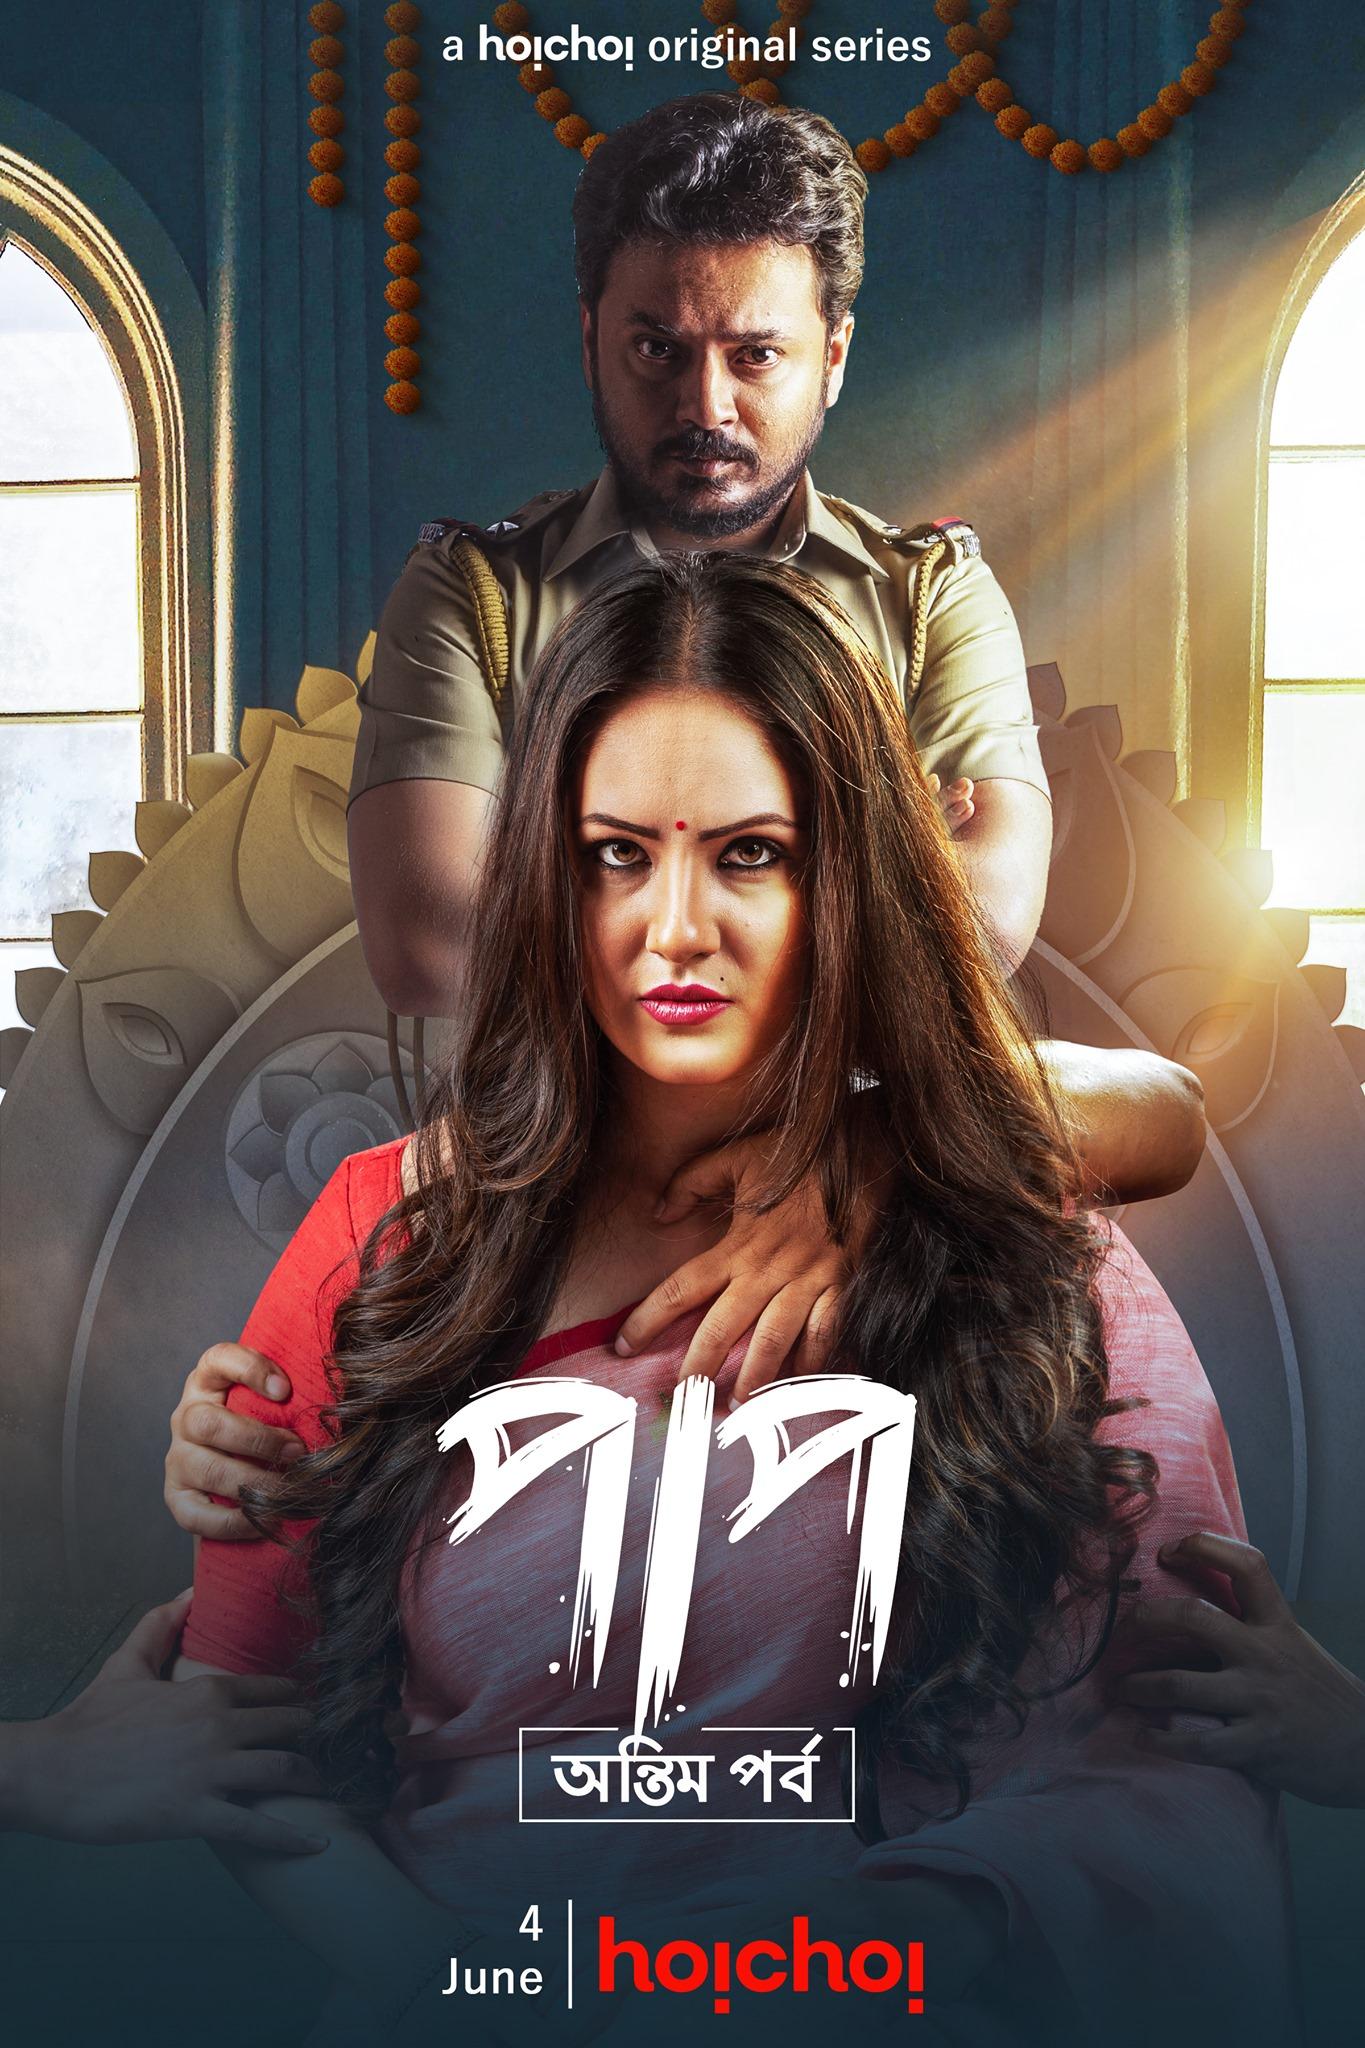 18+ Paap 2021 S02 Bengali Hoichoi Original Complete Web Series 720p HDRip 800MB Download